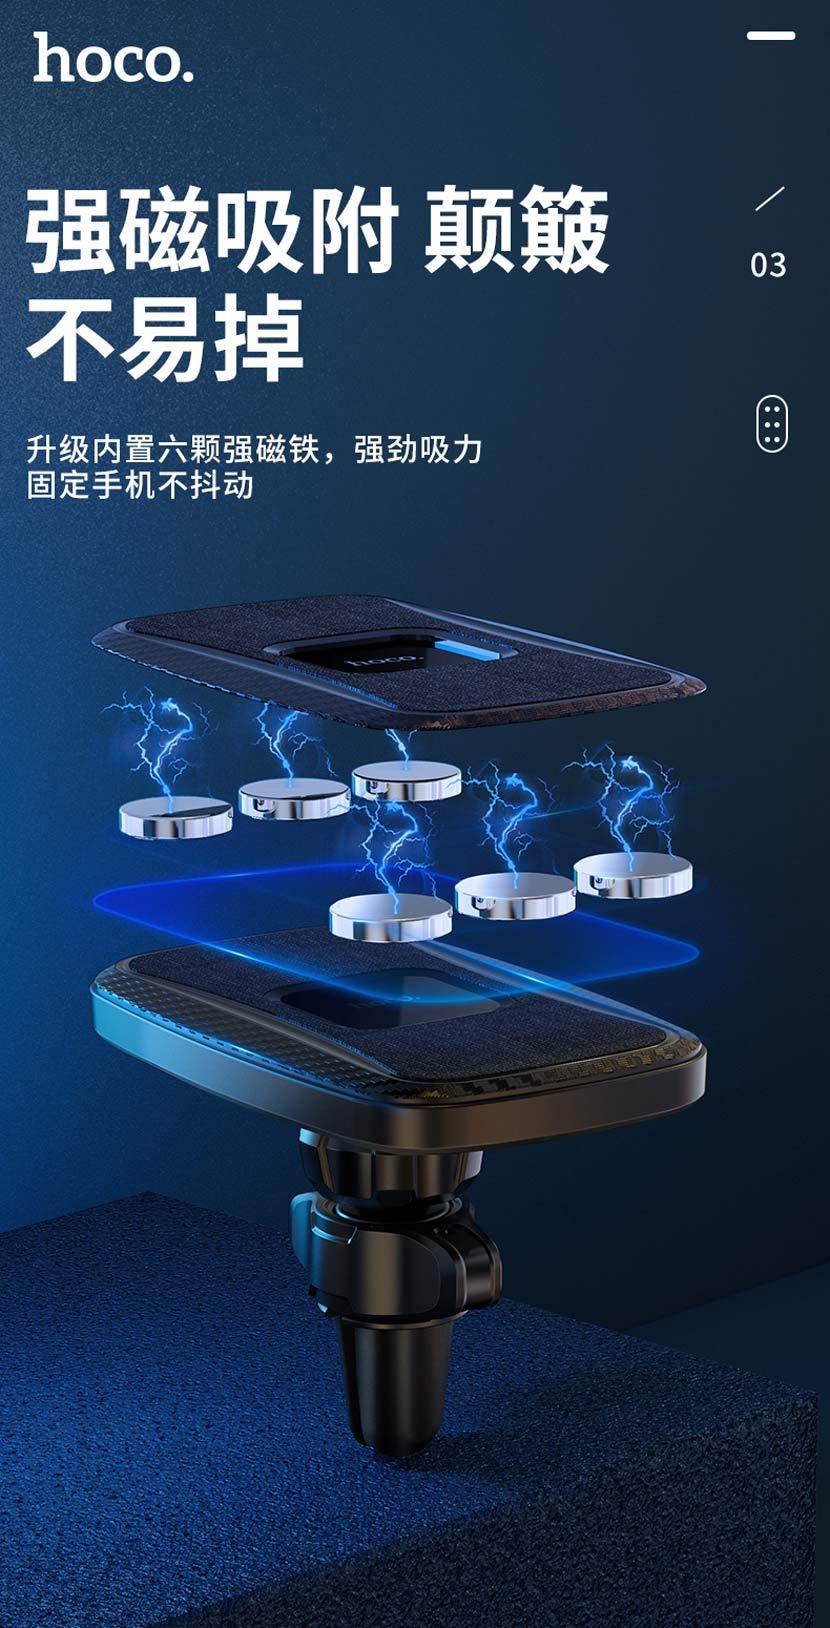 hoco news ca75 magnetic wireless charging car holder adsorption cn